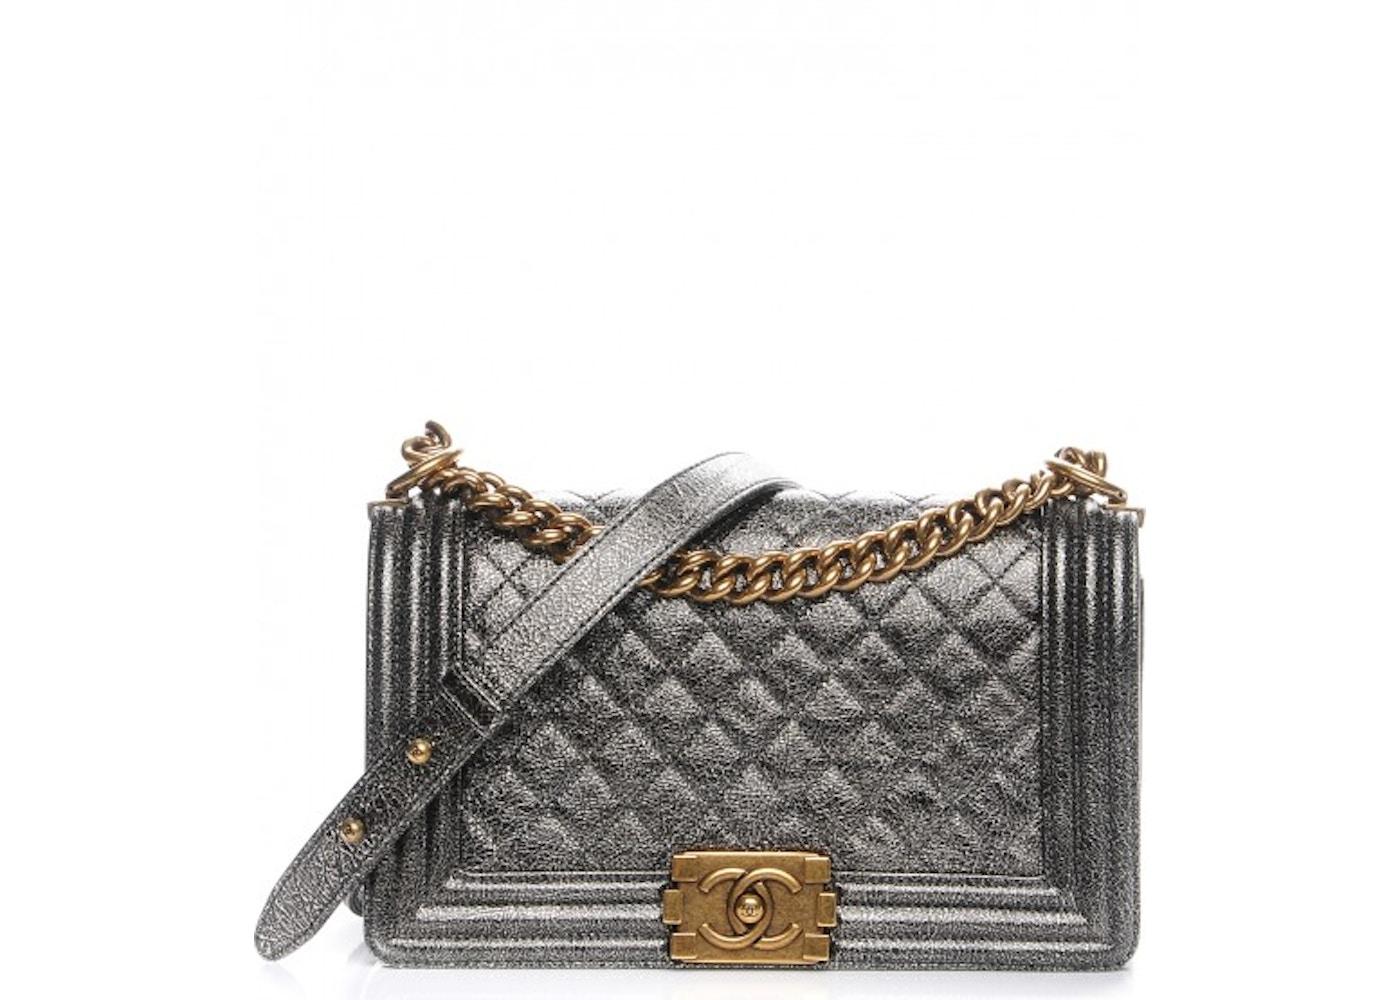 b56716bbb12904 Chanel Boy Flap Quilted Diamond Cracked Metallic Calfskin Medium ...